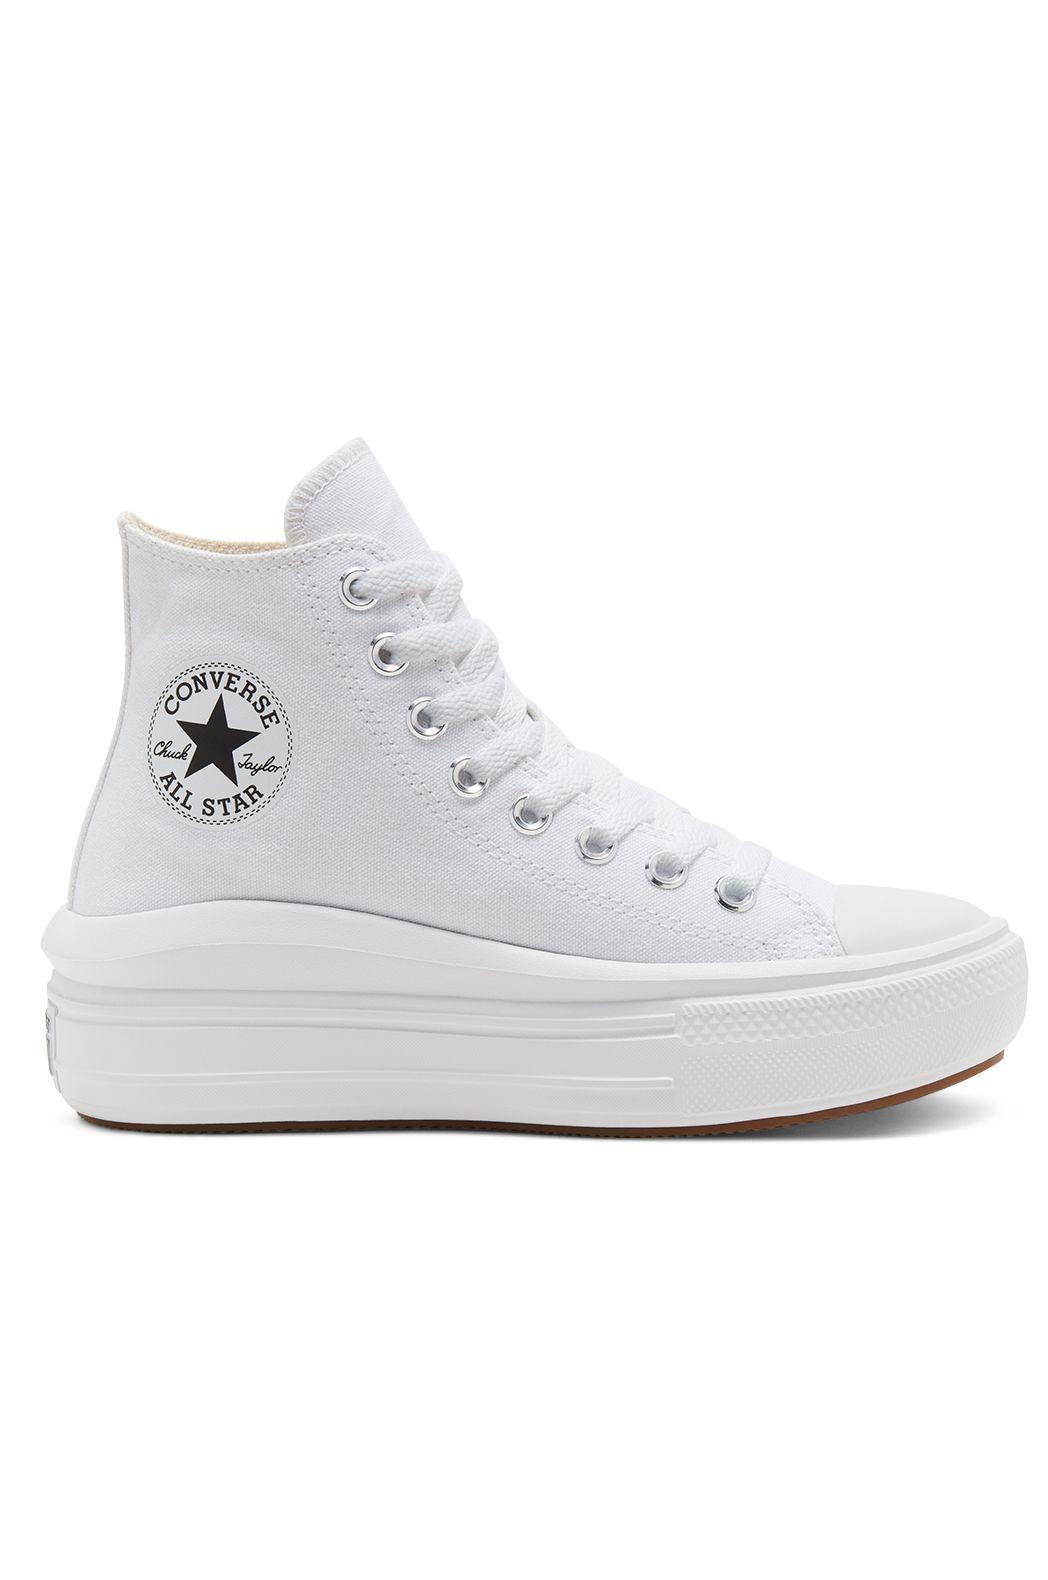 Tenis Converse CHUCK TAYLOR ALL STAR MOVE HI White/Natural Ivory/Black